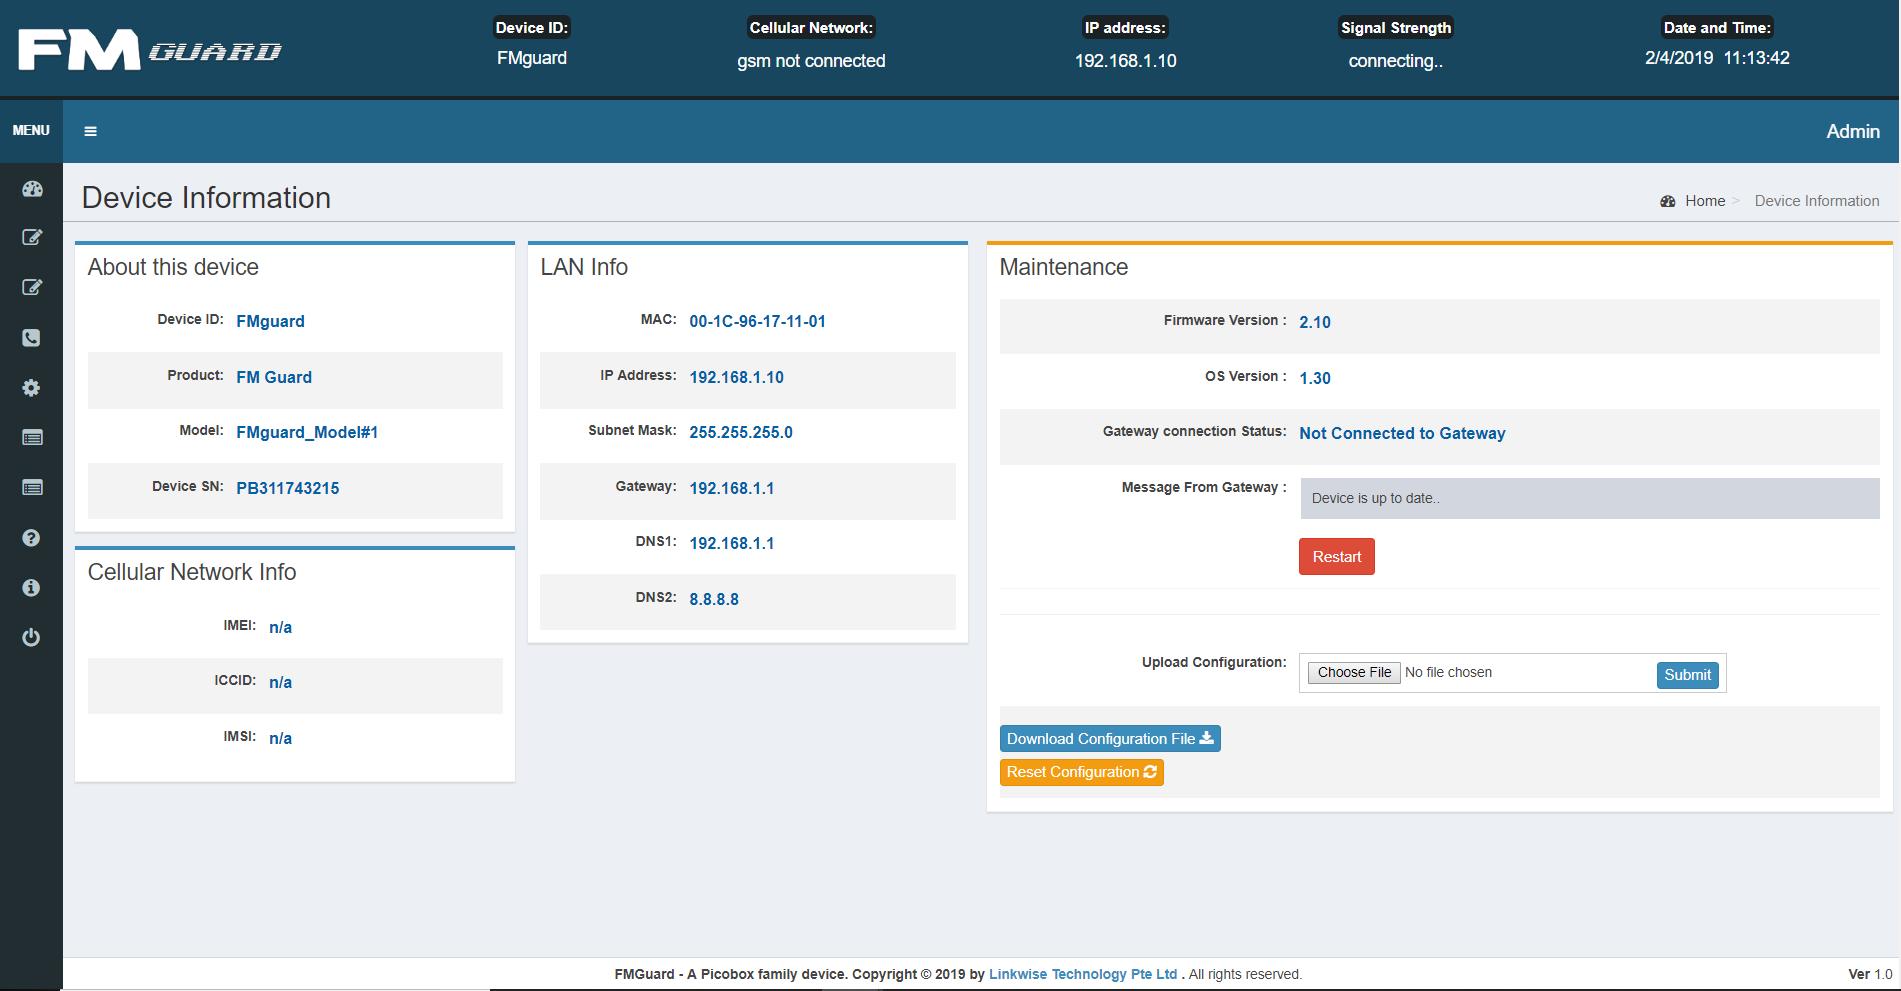 Linkwise Tech Picobox FMG UI